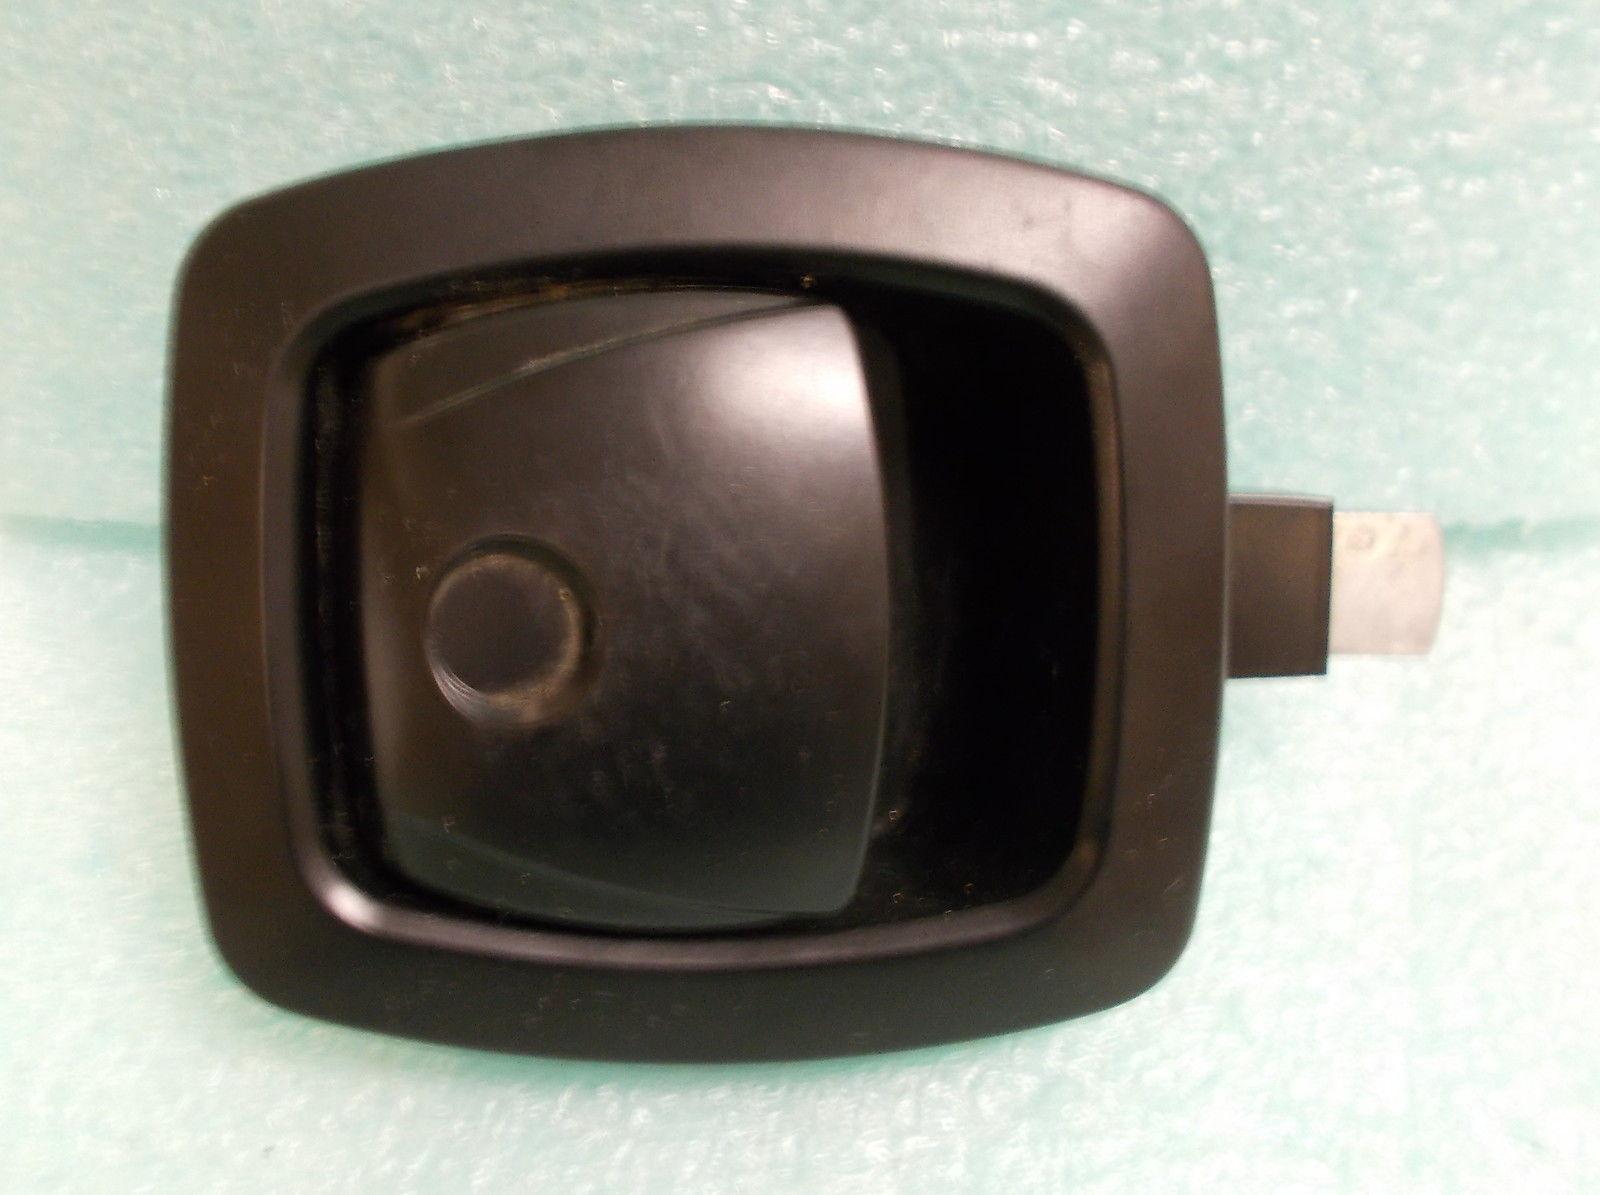 Southco Black Non Locking Push To Open Door Latch #R3 20 300 50  UPC:710534489331